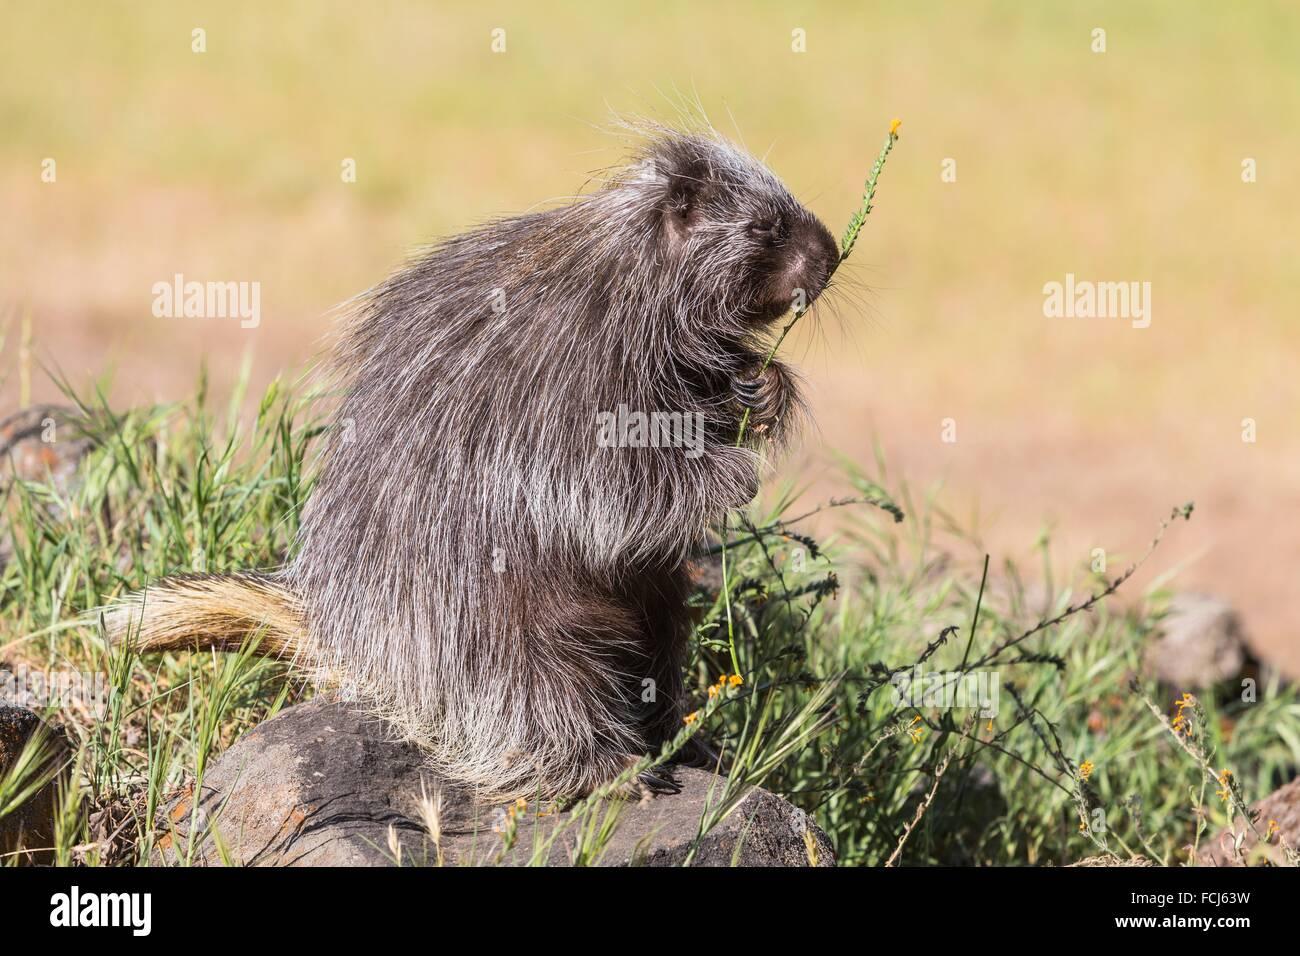 Cute porcupine (Erethizon dorsatum) feeding on some flowers, captive, California, USA Stock Photo